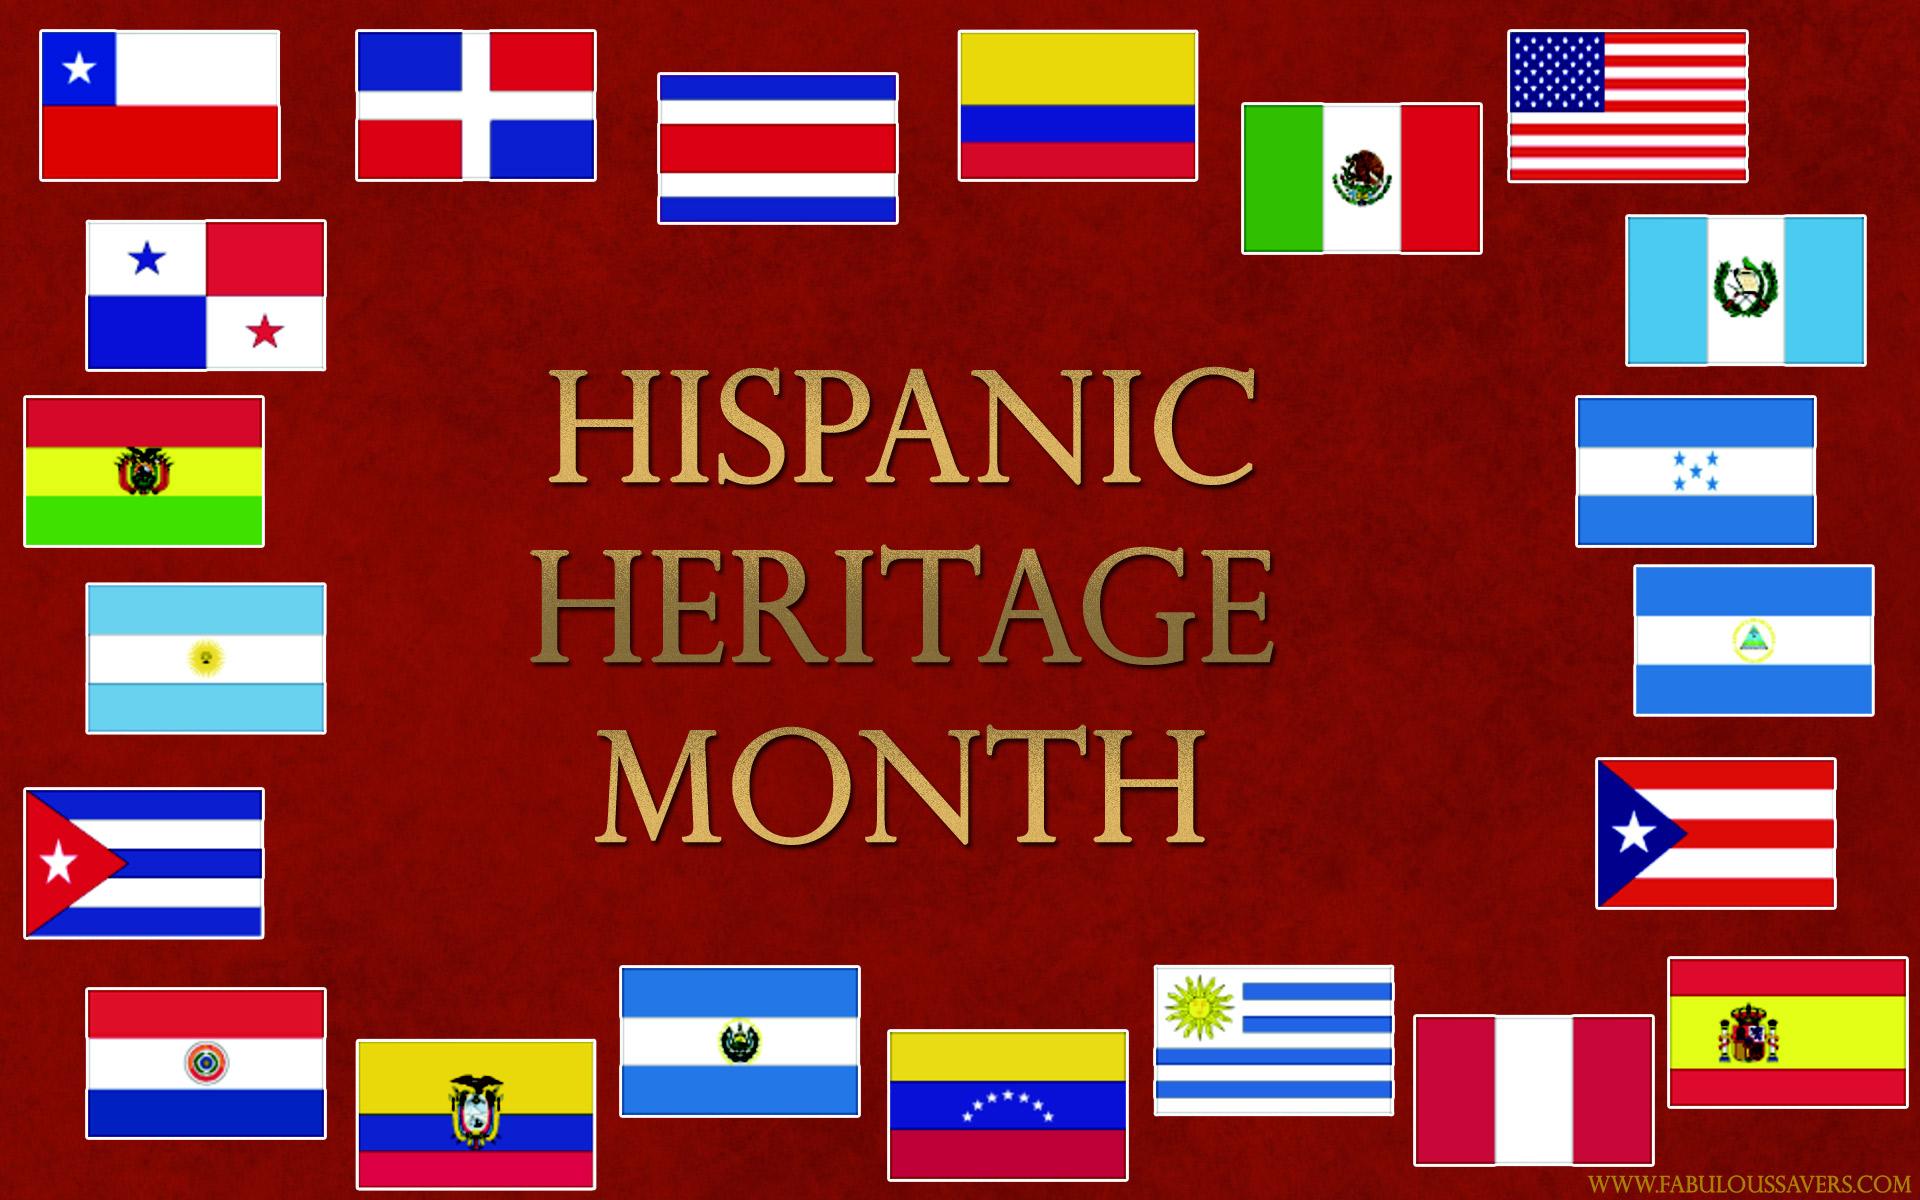 Hispanic heritage month clip art picture freeuse download Free hispanic heritage clipart - ClipartFest picture freeuse download